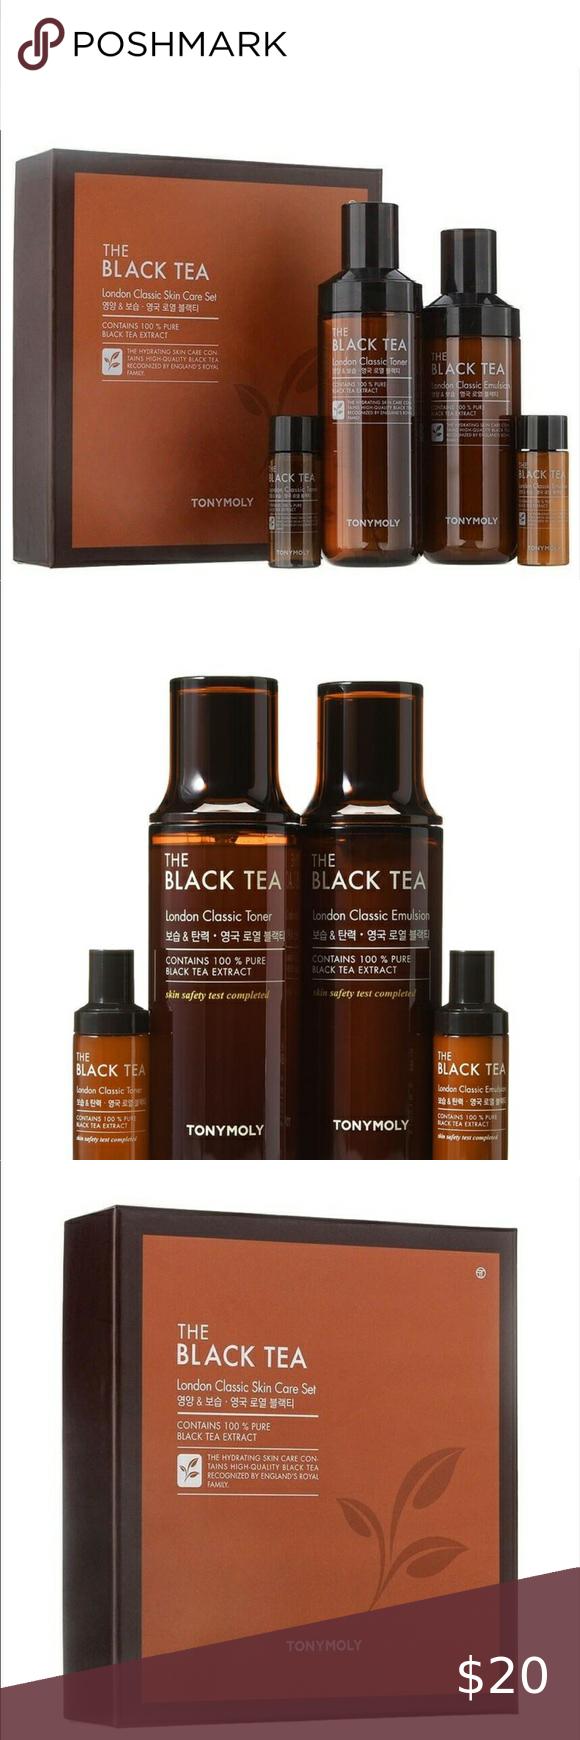 New Tony Moly Black Tea Skin Care Set in 2020 Skincare